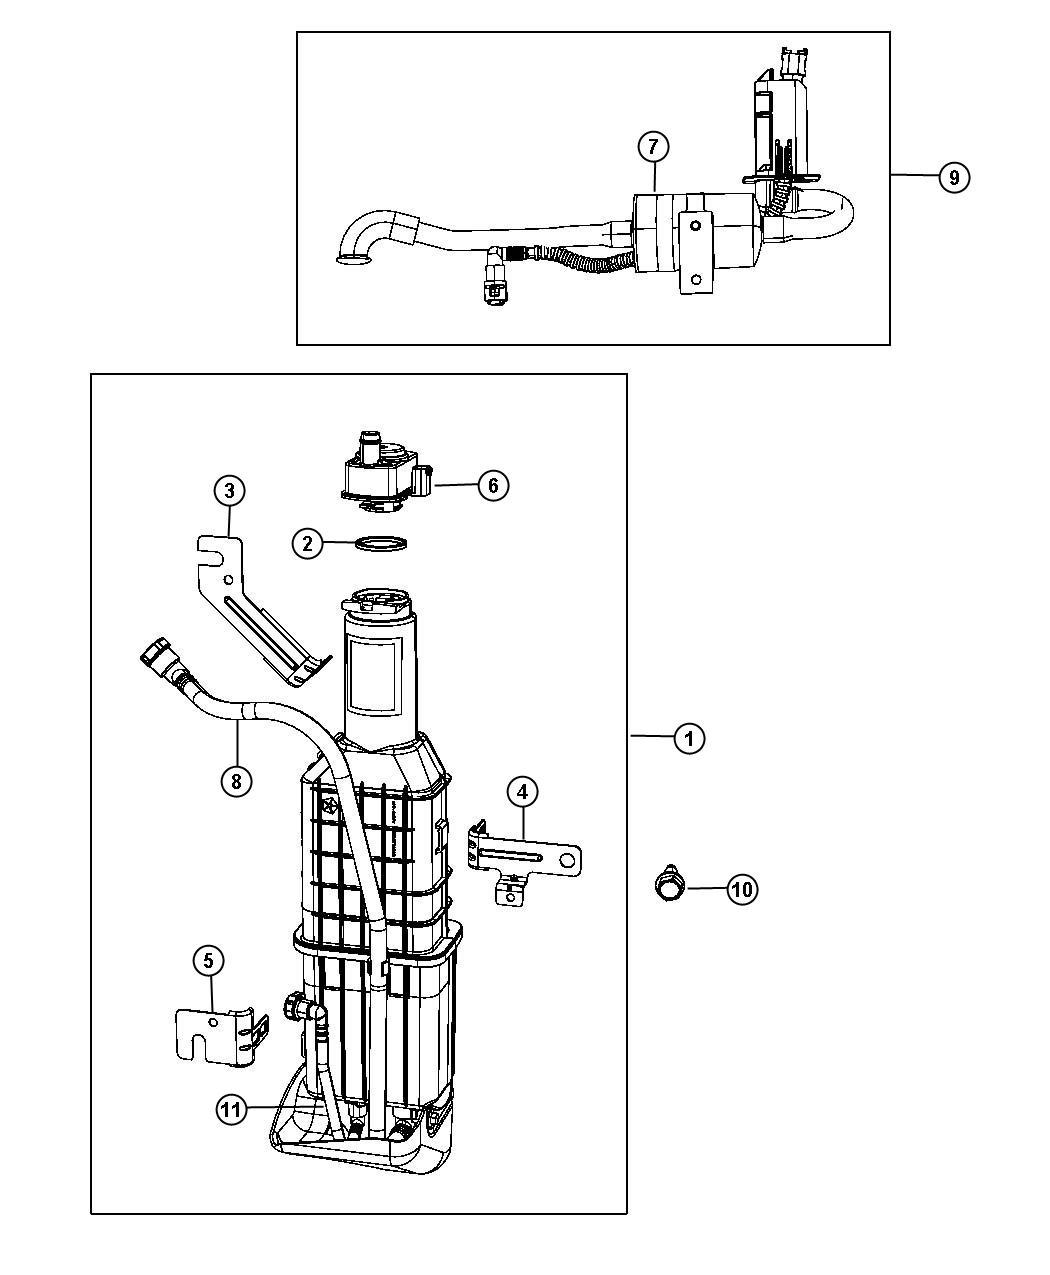 Chrysler Sebring Filter Fuel Vapor Vent Canister